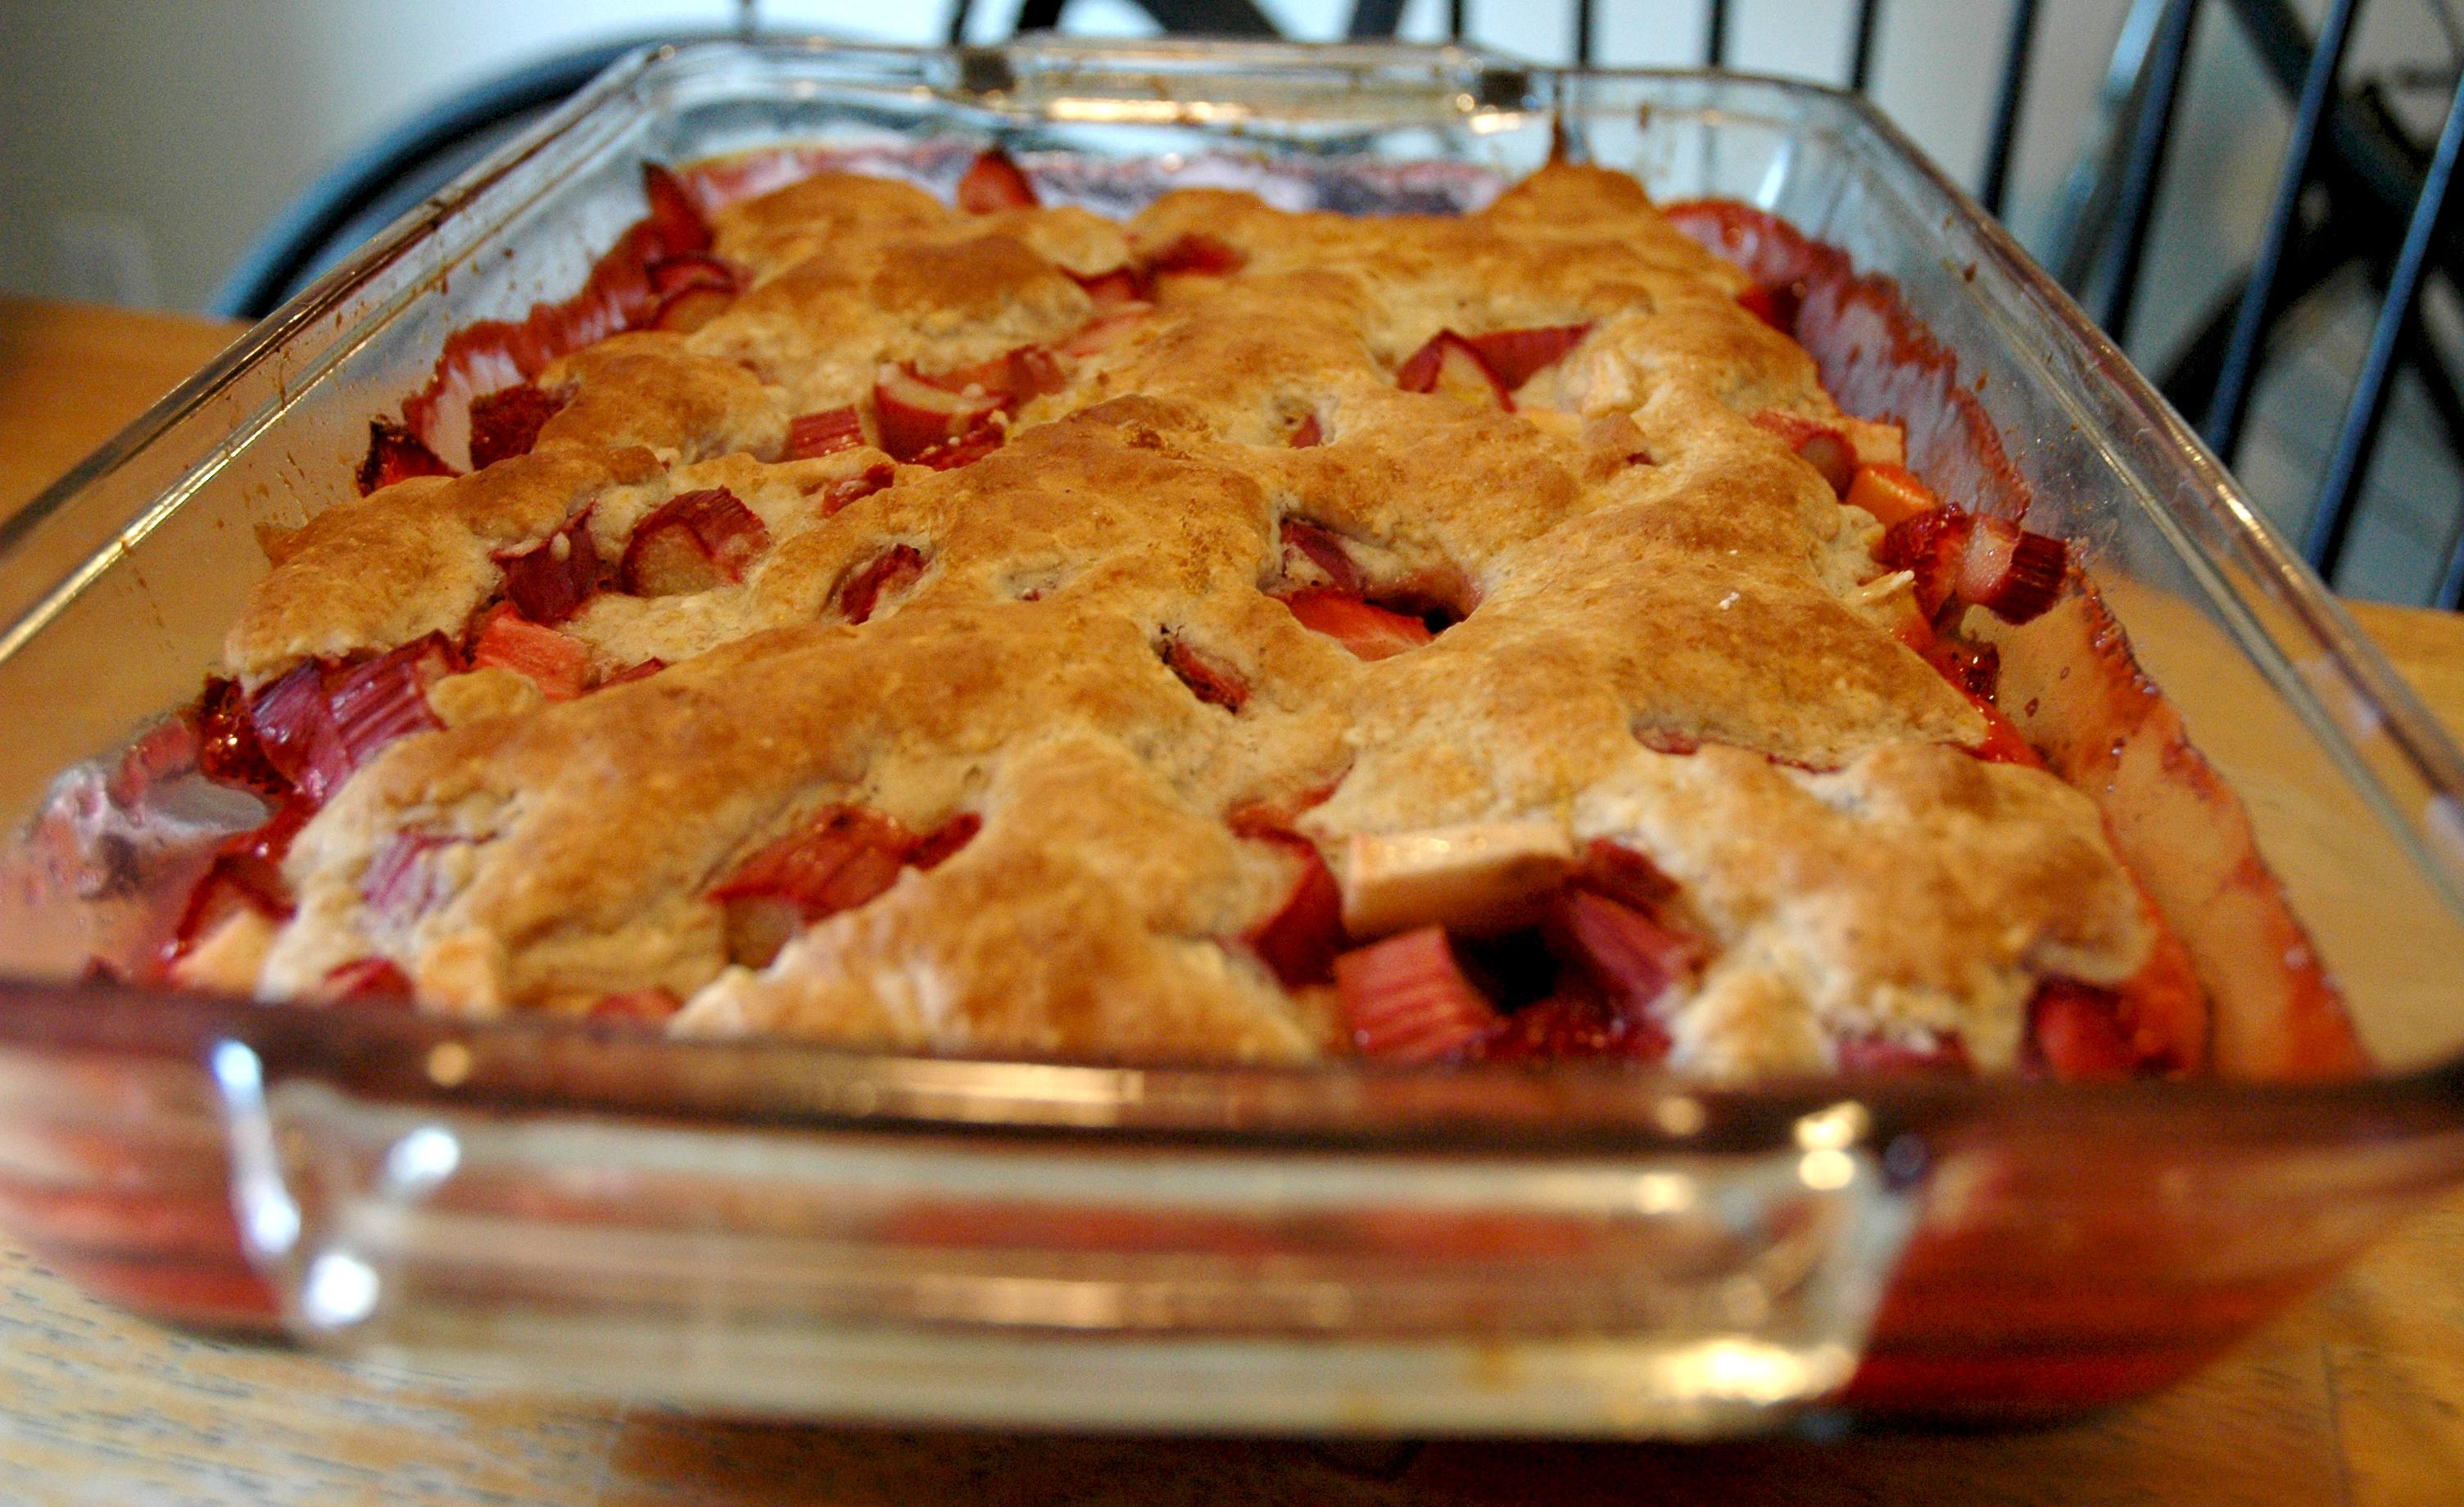 lightened up strawberry rhubarb cobbler